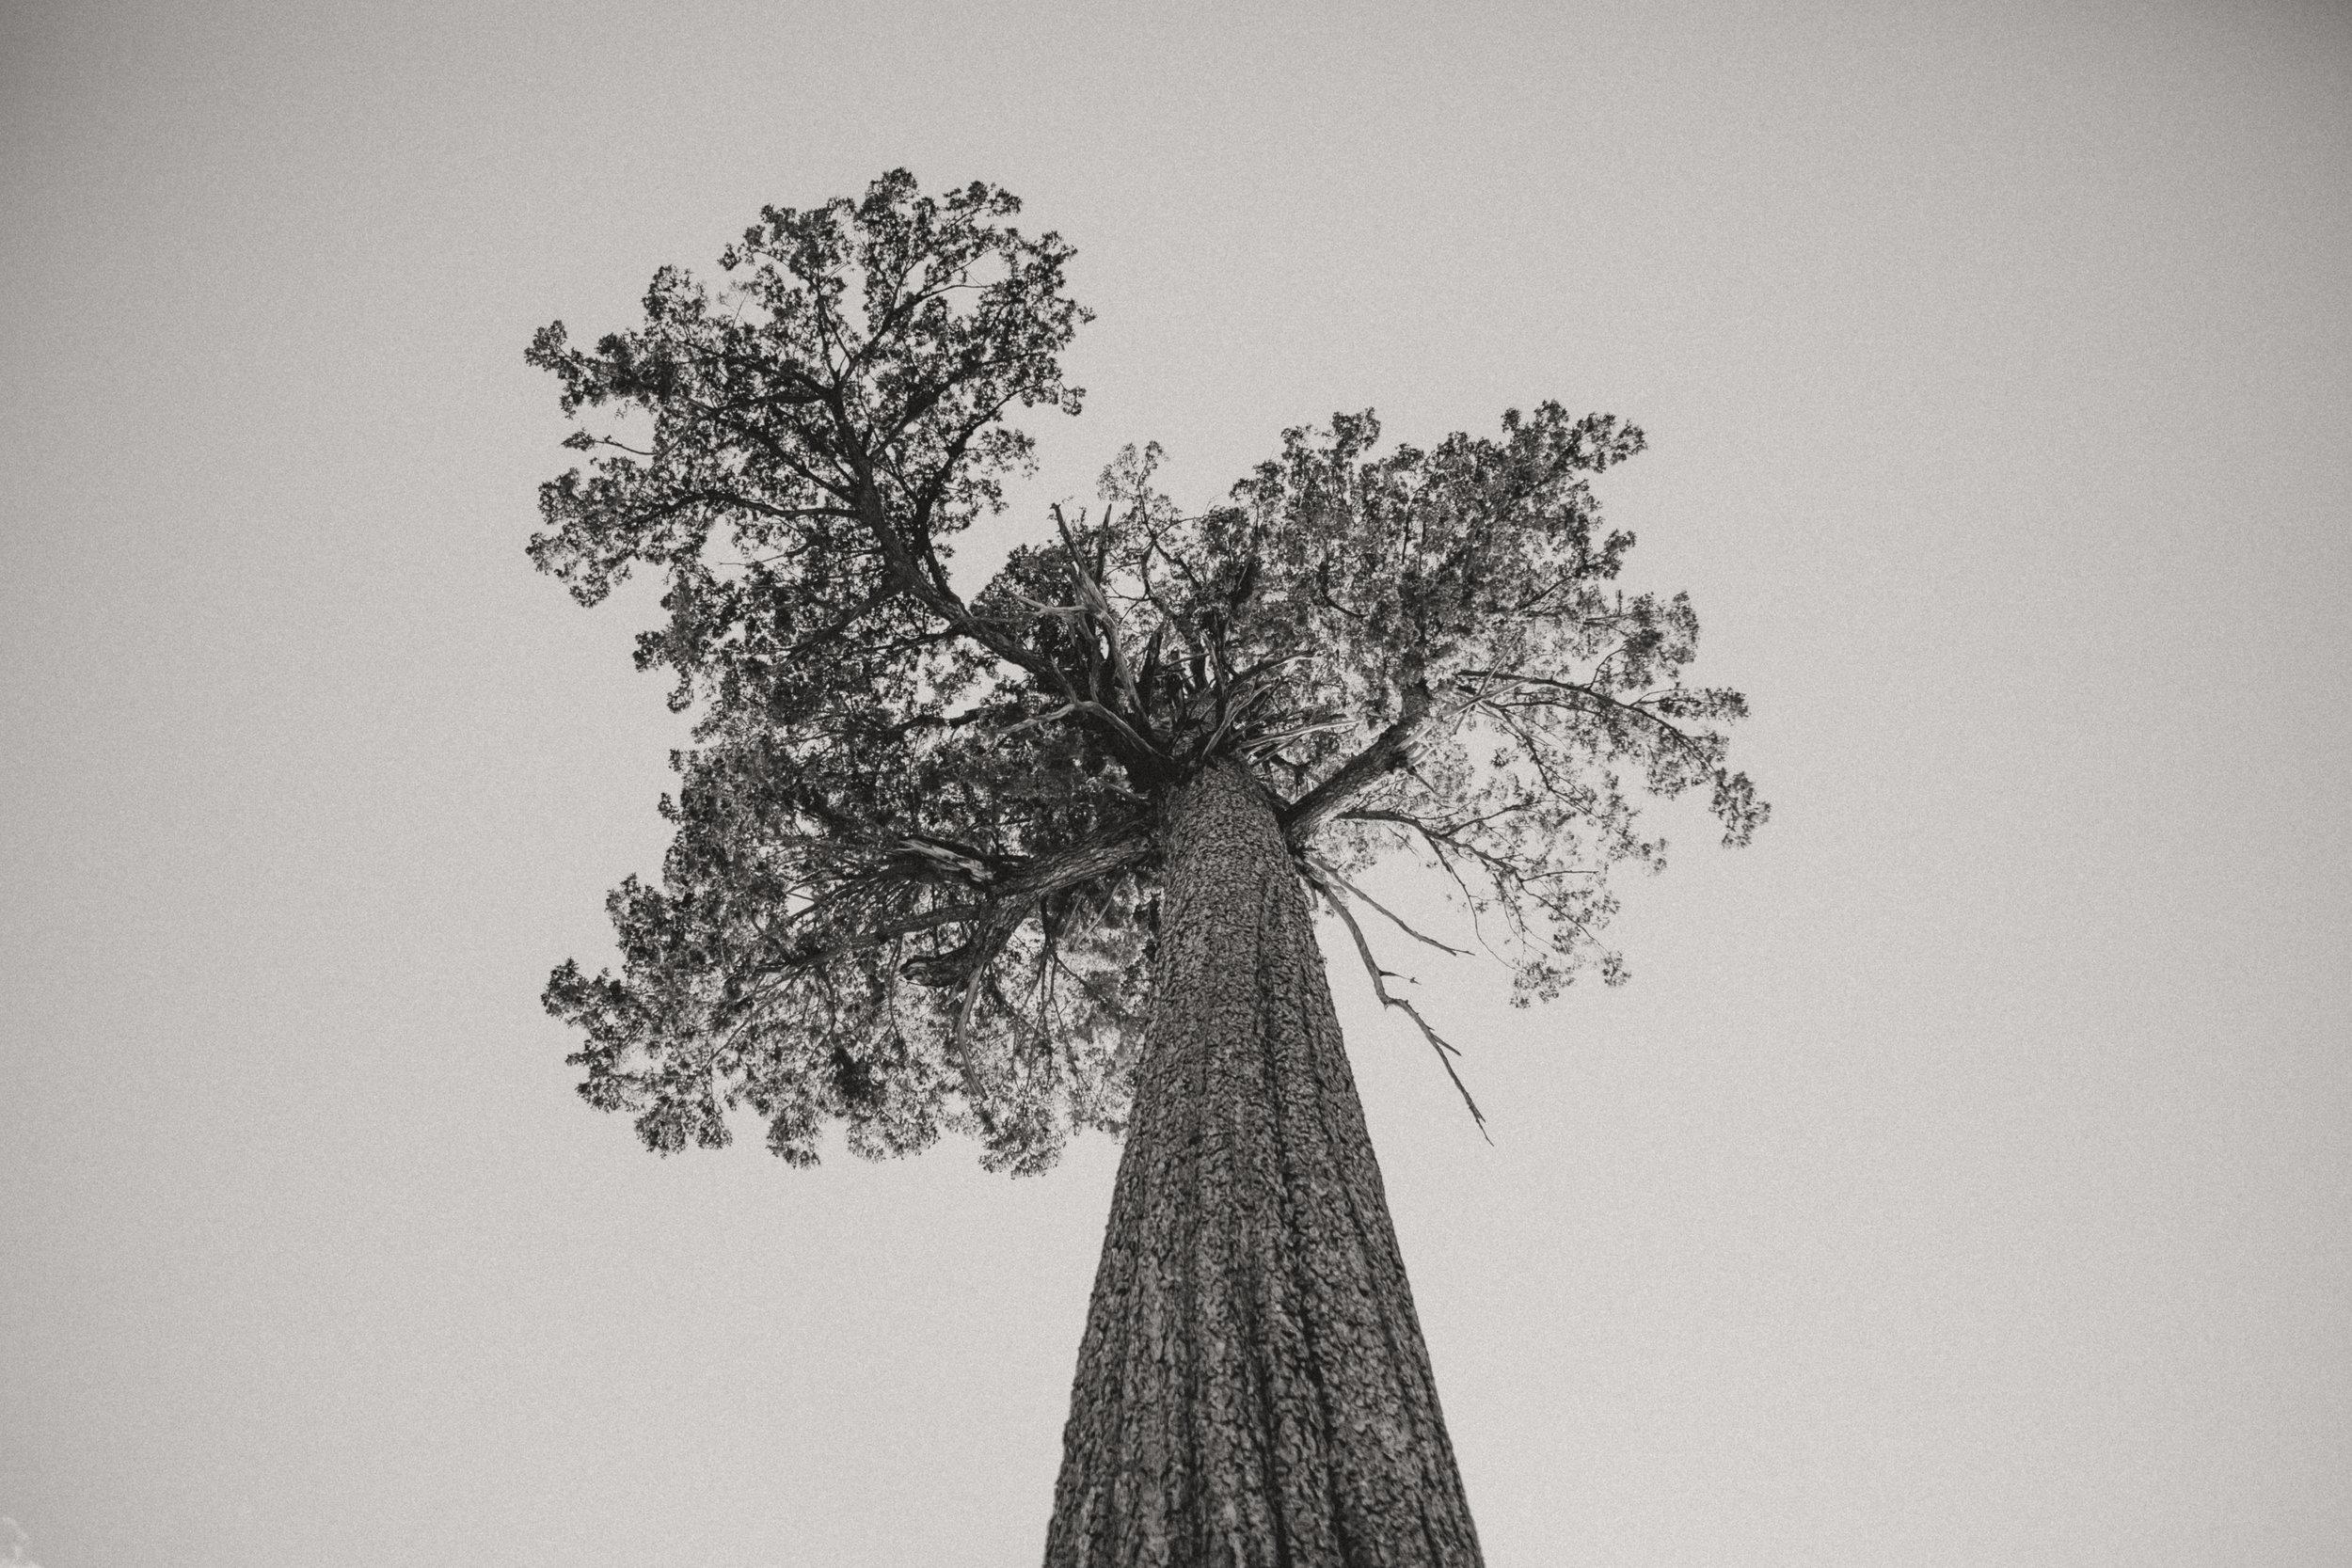 patagonia-2019-emilybeekscreative-123.jpg